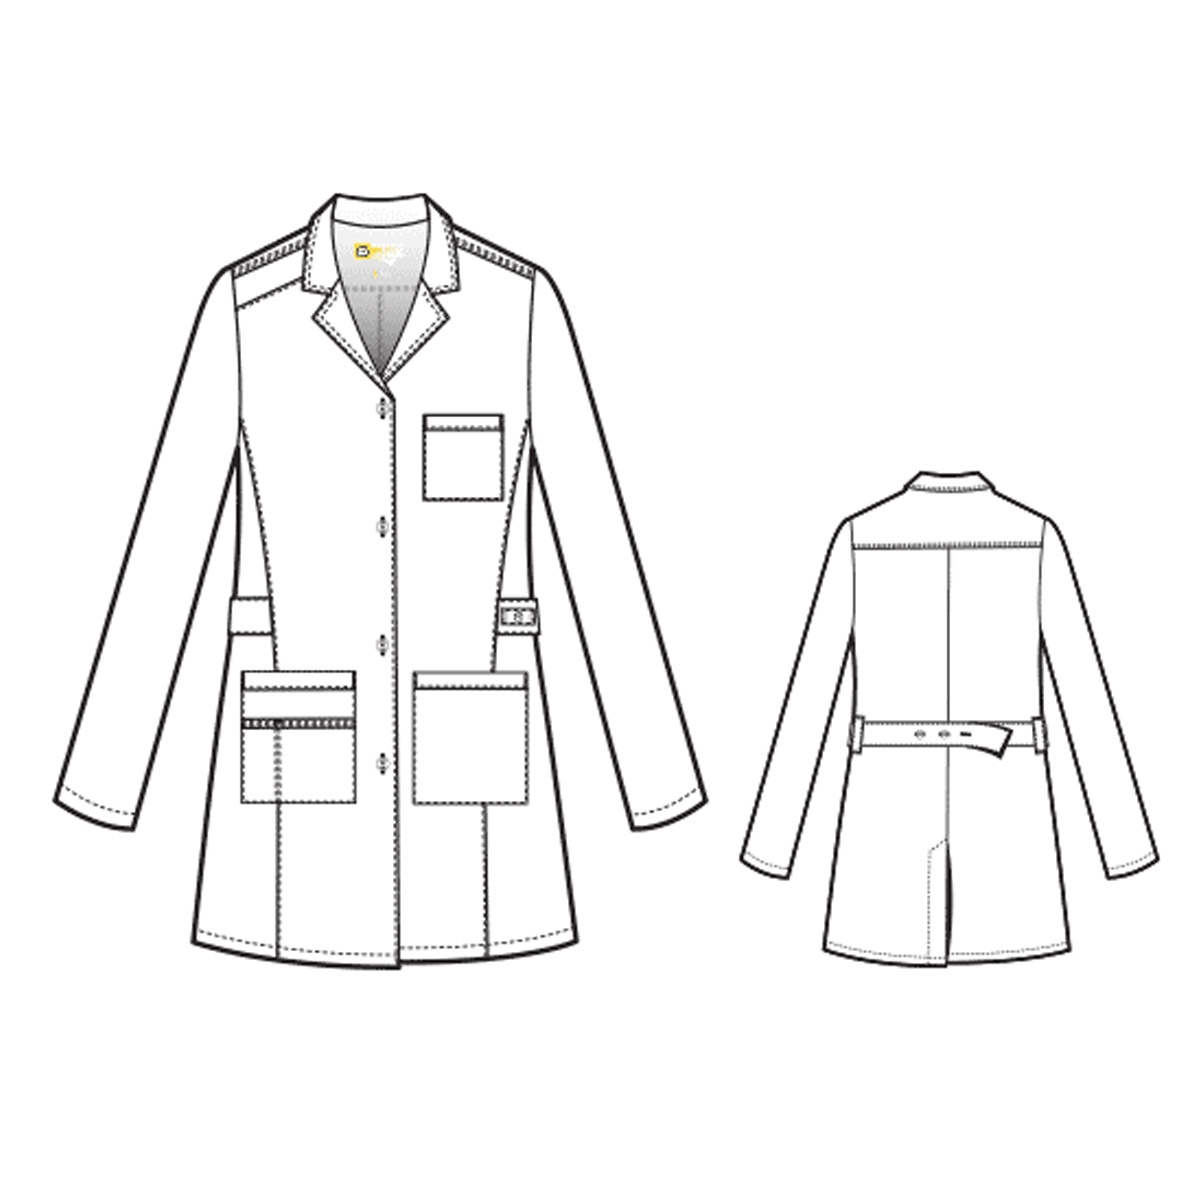 9a1fbe84921 The Utopia Fashion Lab Coat For Women - WonderWink Scrubs